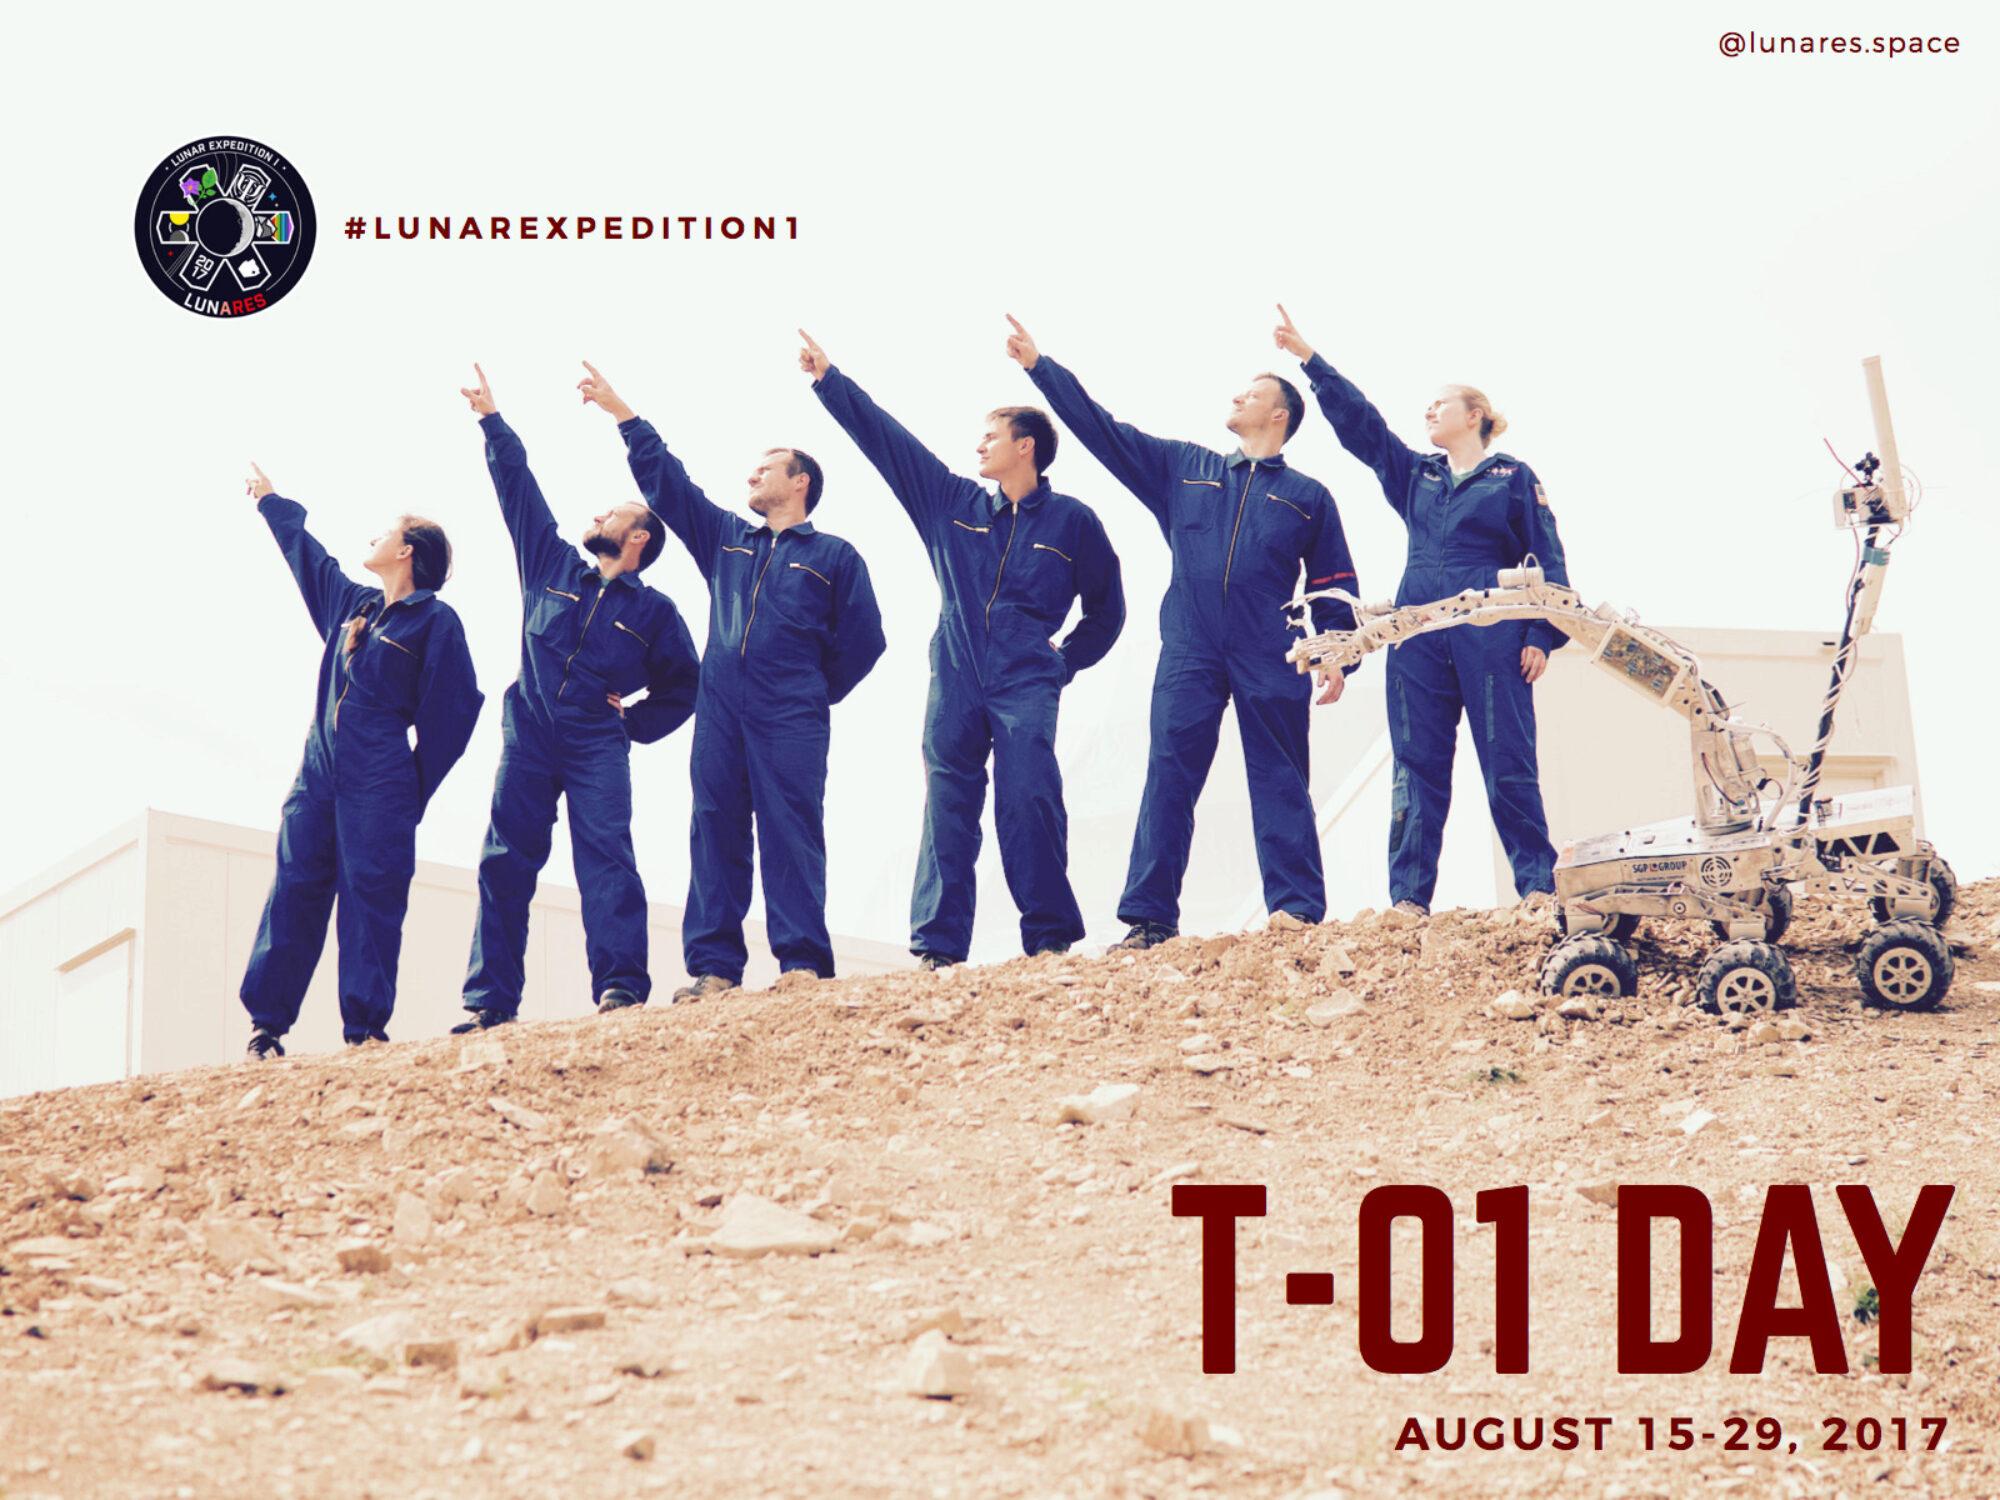 lunar-expedition-01/T-01-Days.jpg